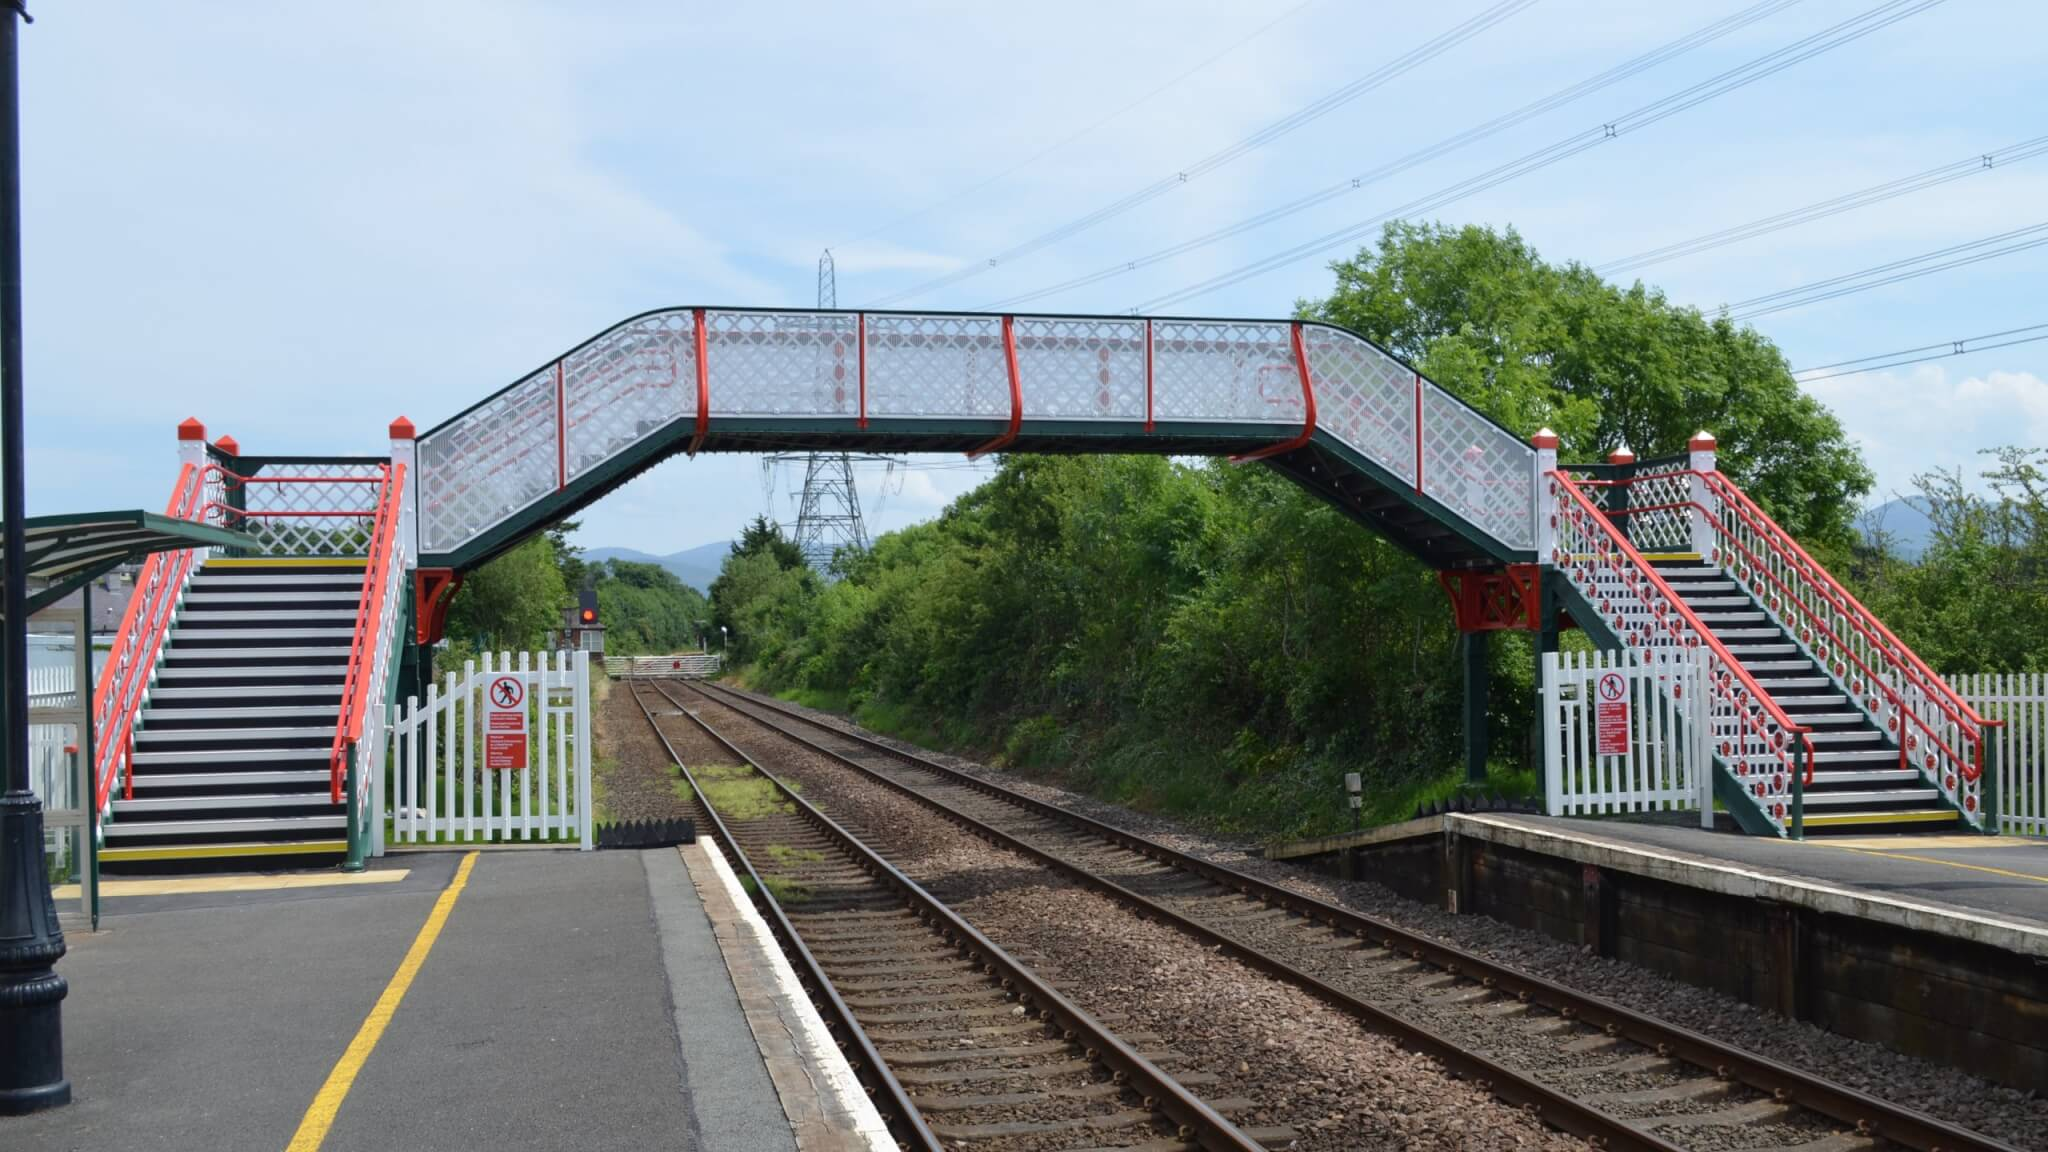 Llanfairpwll Station Footbridge